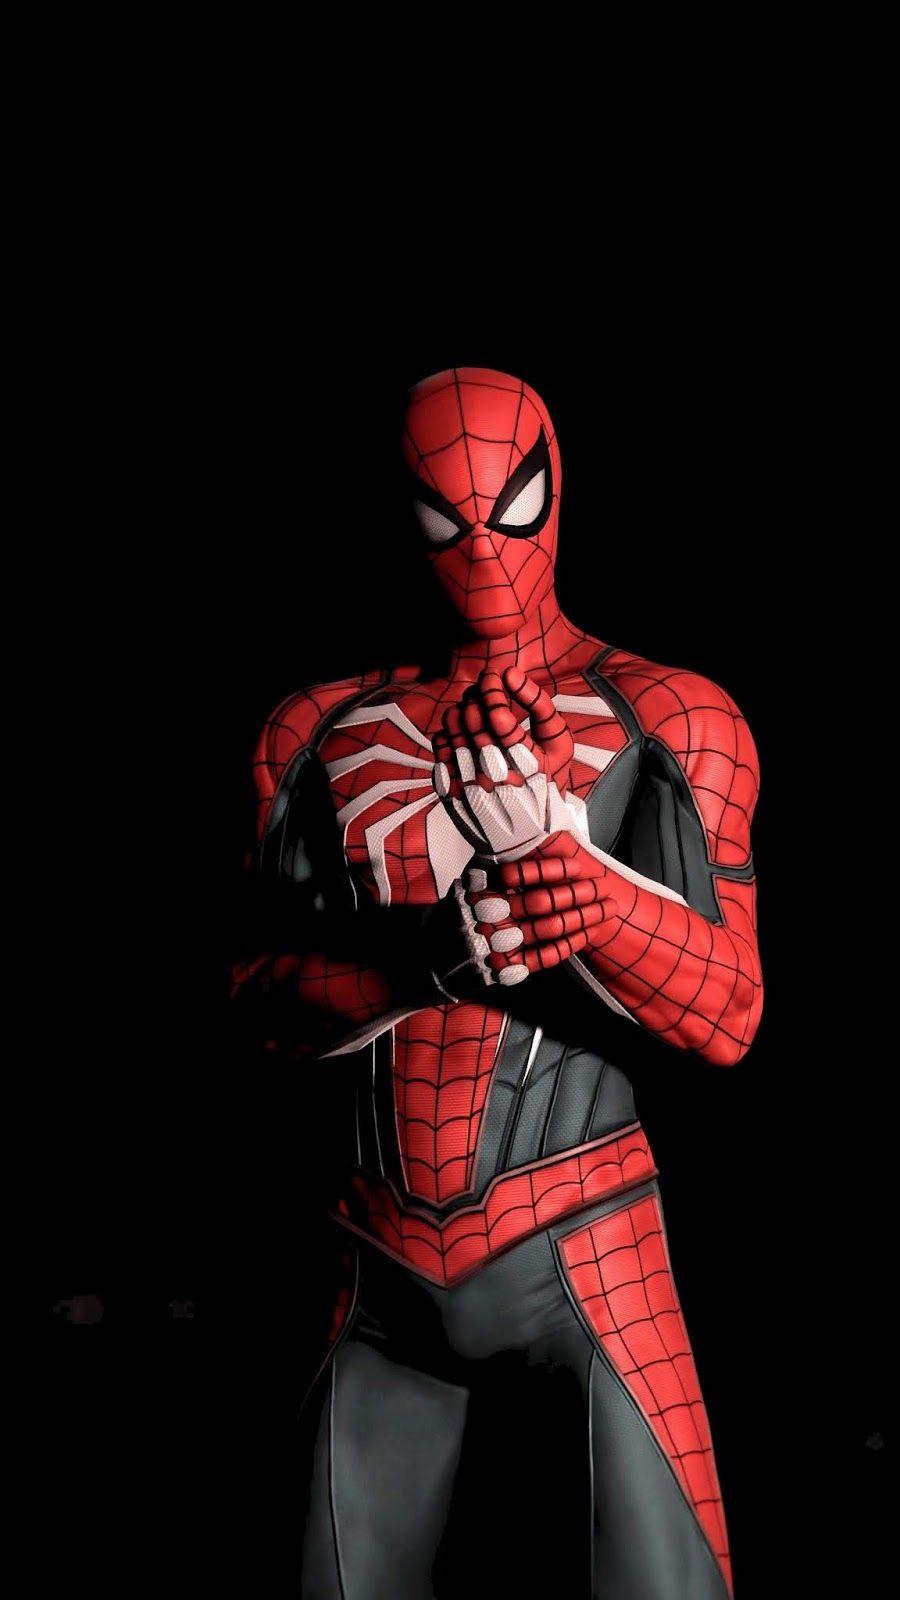 Spiderman Amoled Spiderman Spiderman Spider Marvel Spiderman